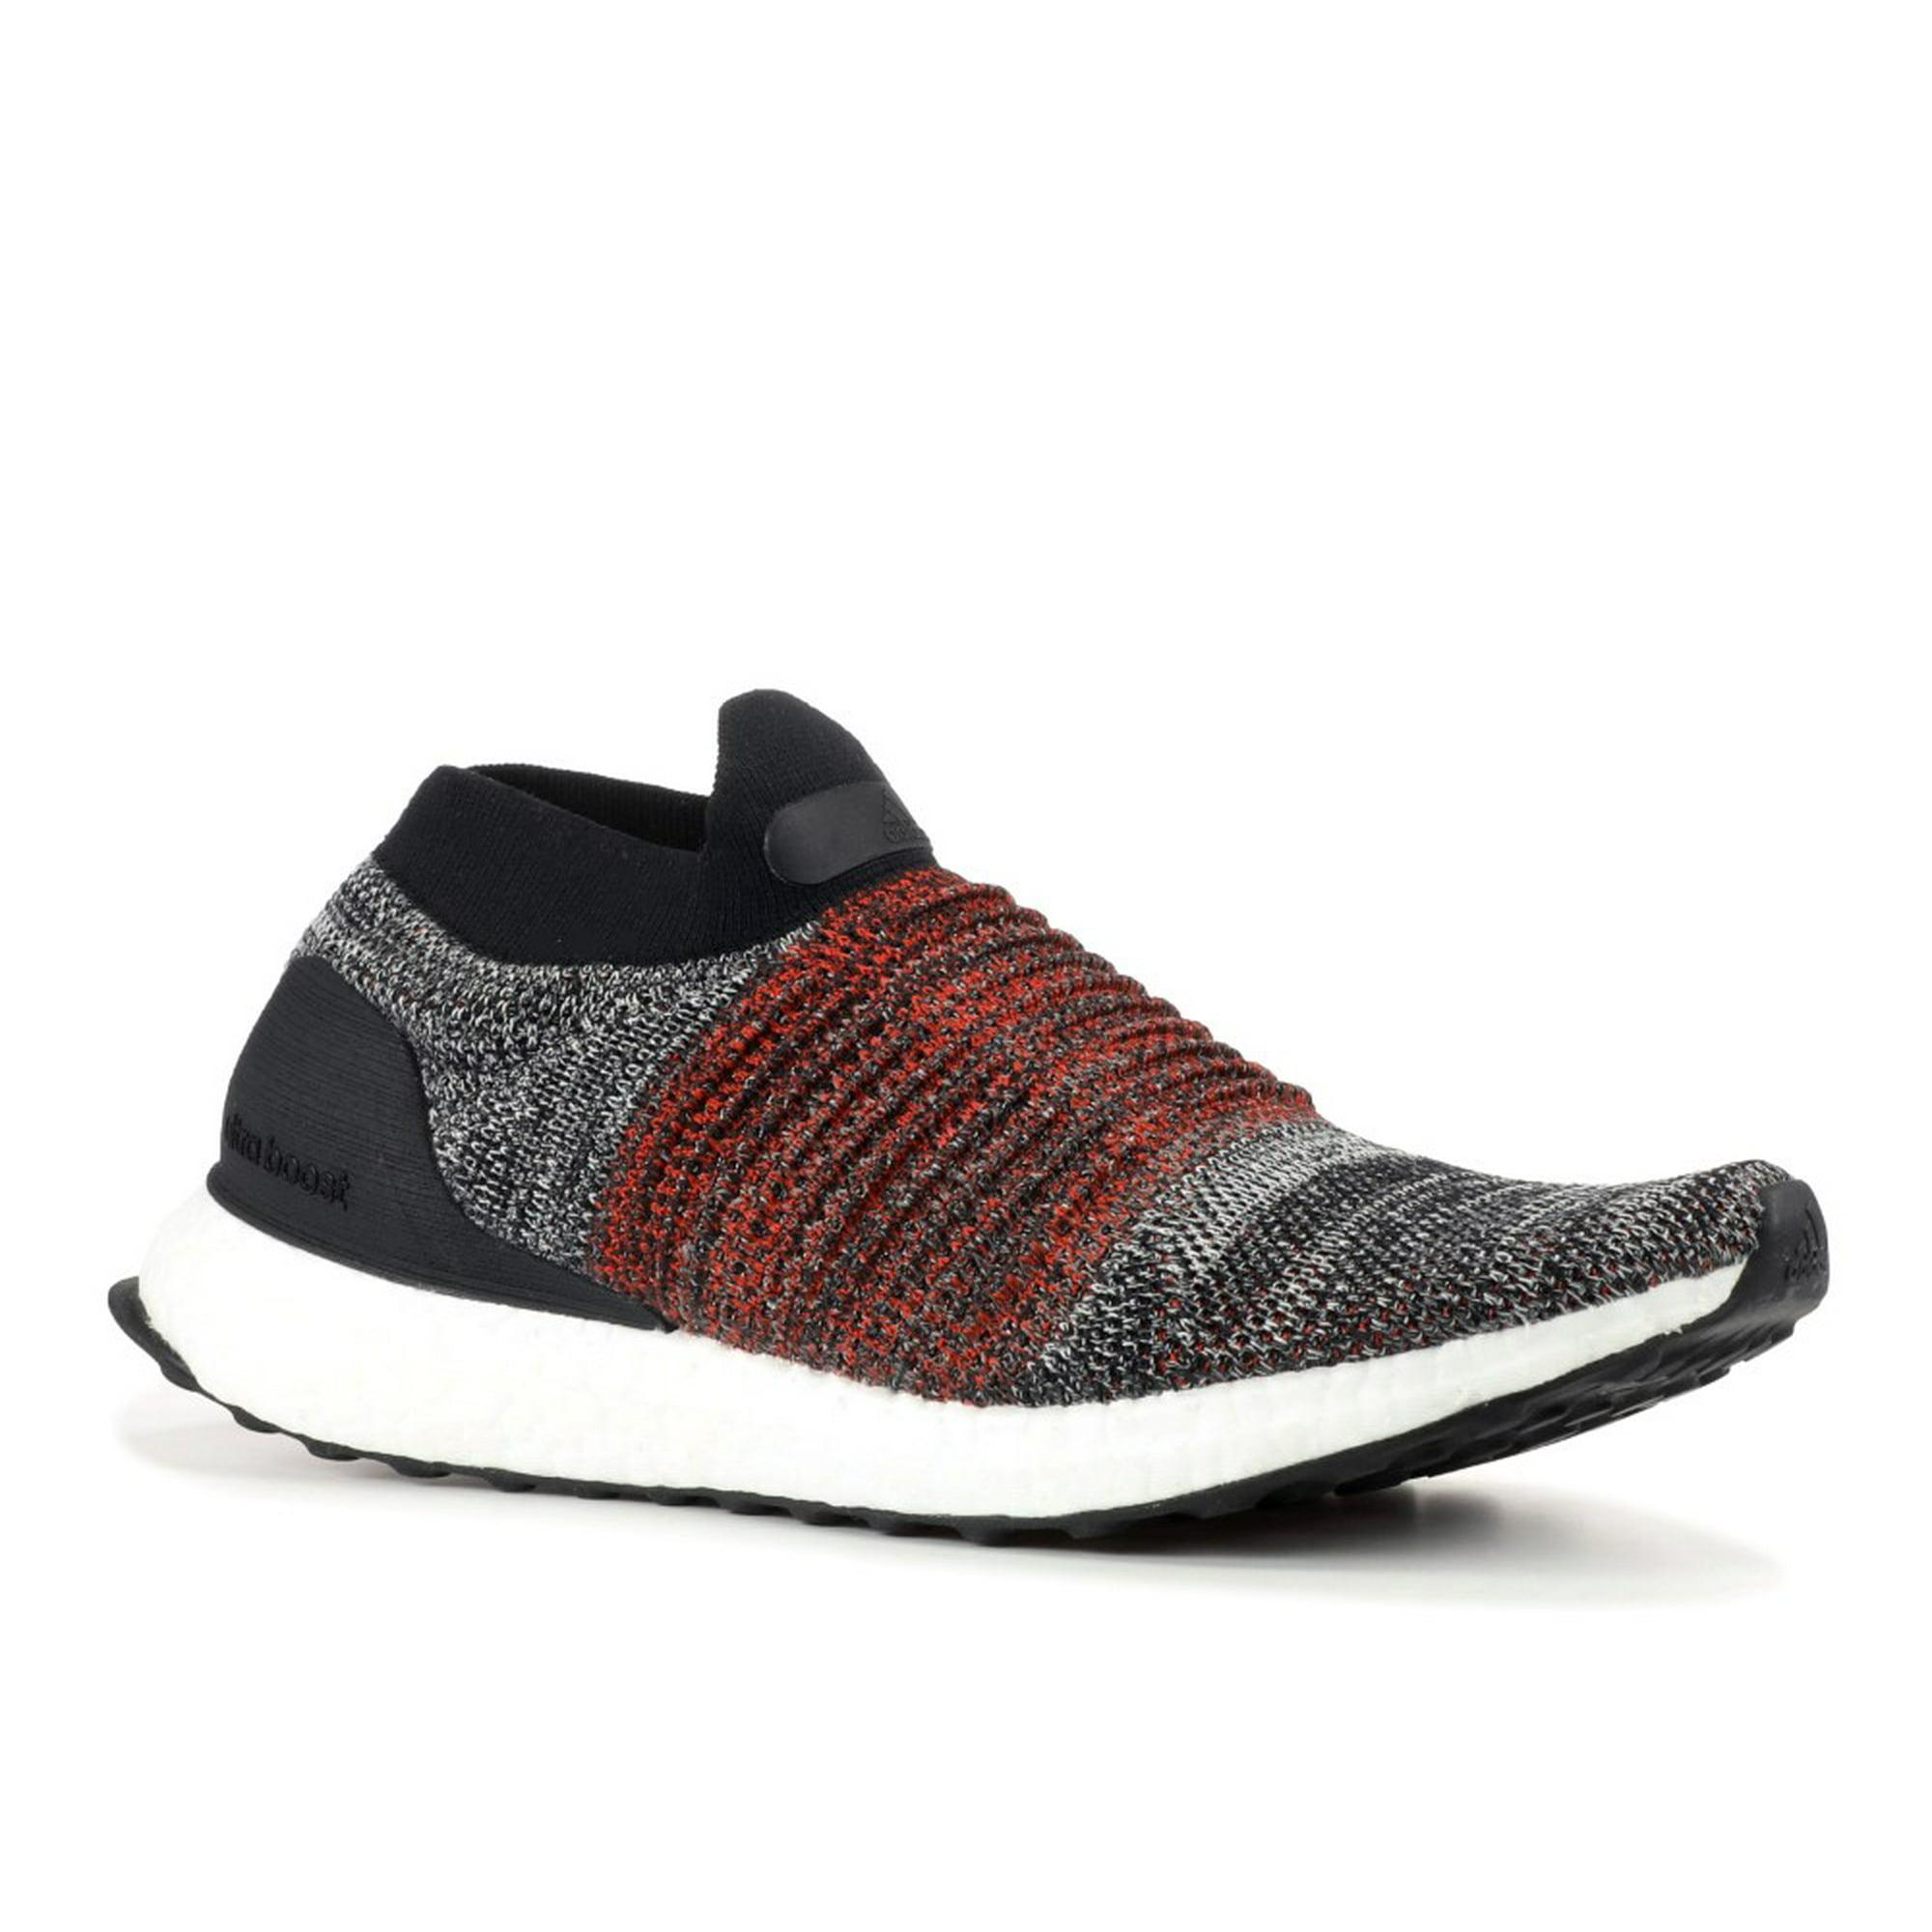 Adidas Men Ultraboost Laceless S80769 Size 11 Walmart Canada